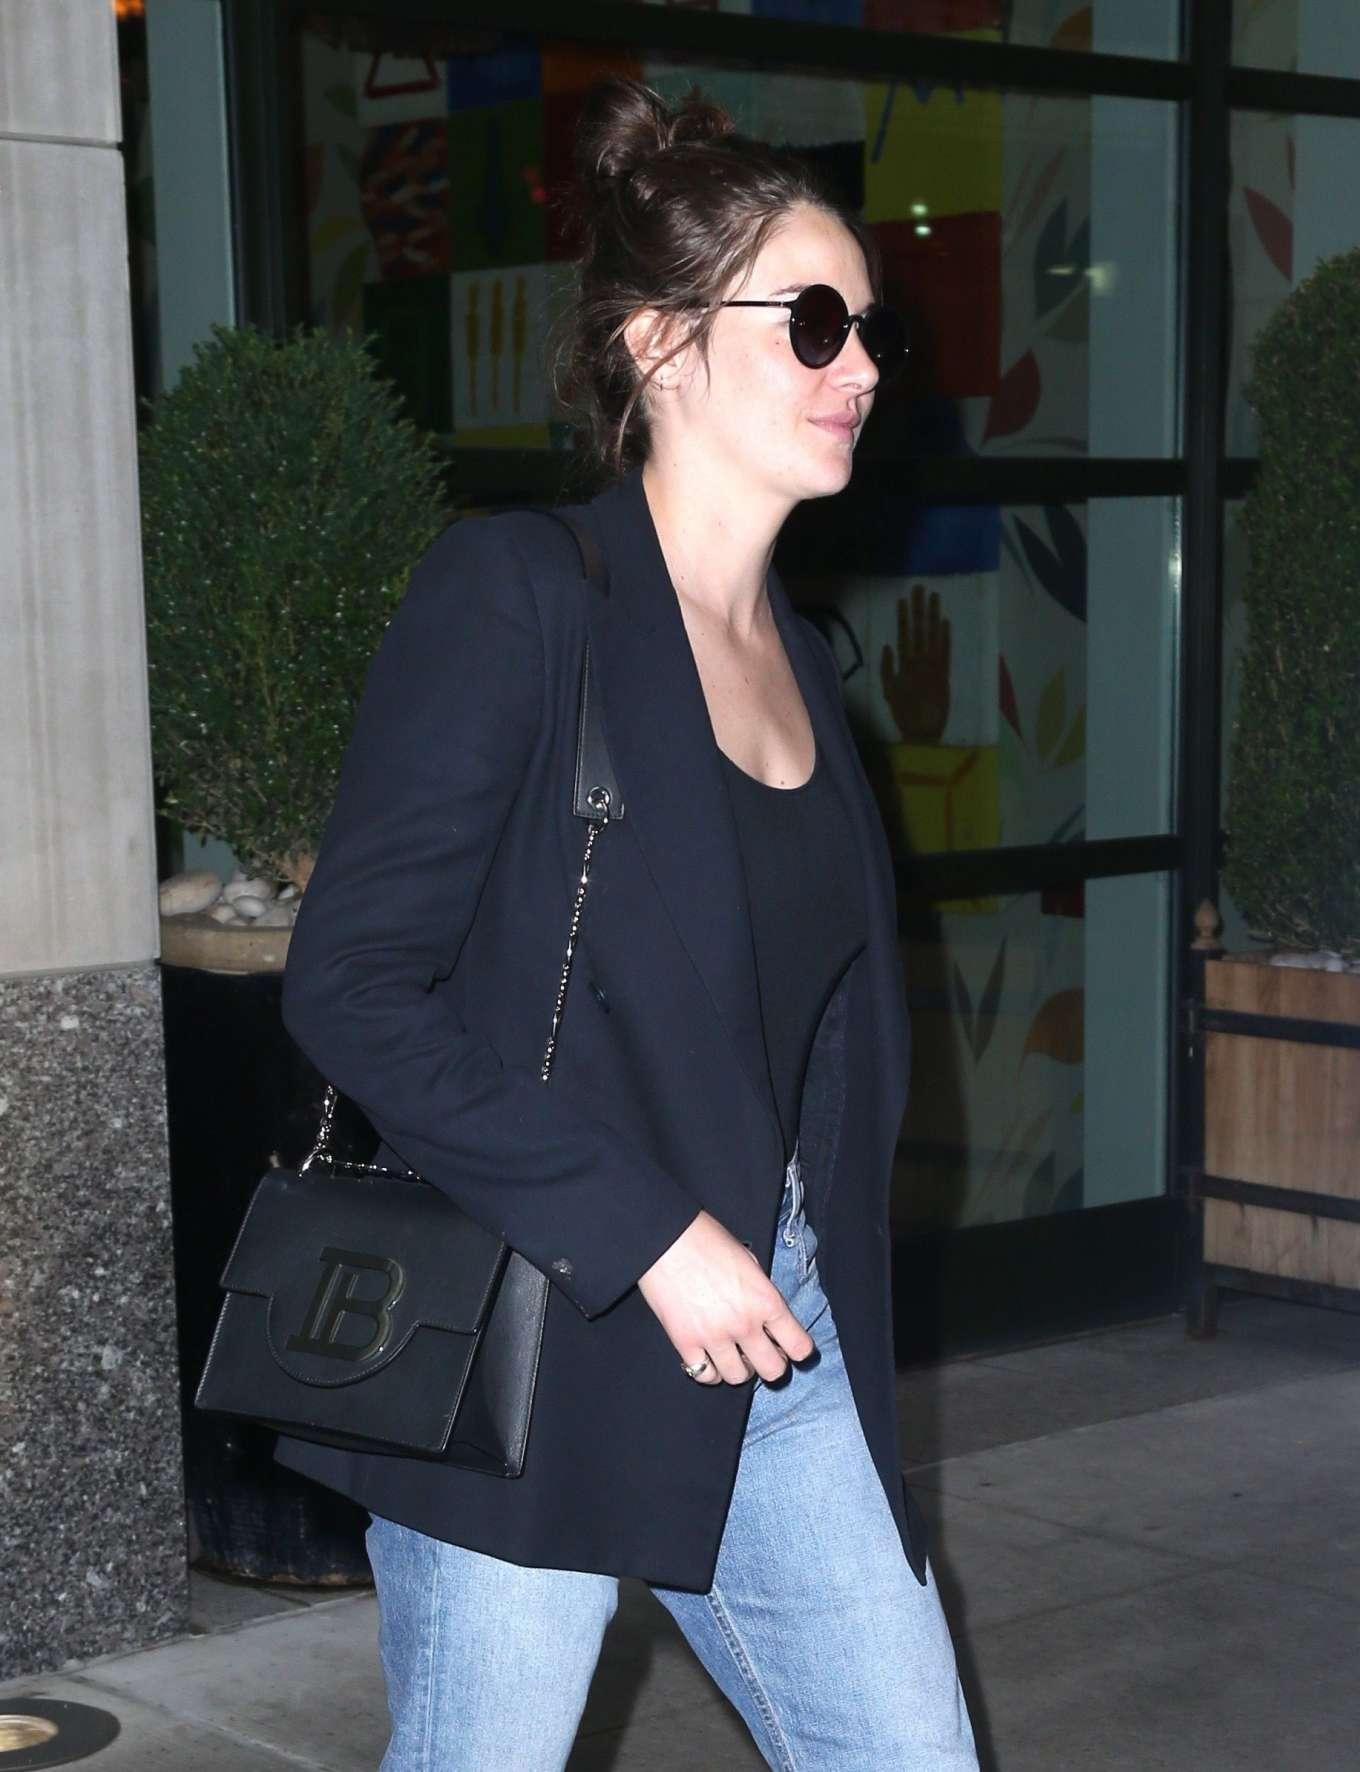 Shailene Woodley 2019 : Shailene Woodley in a Blue Blazer and Jeans-18